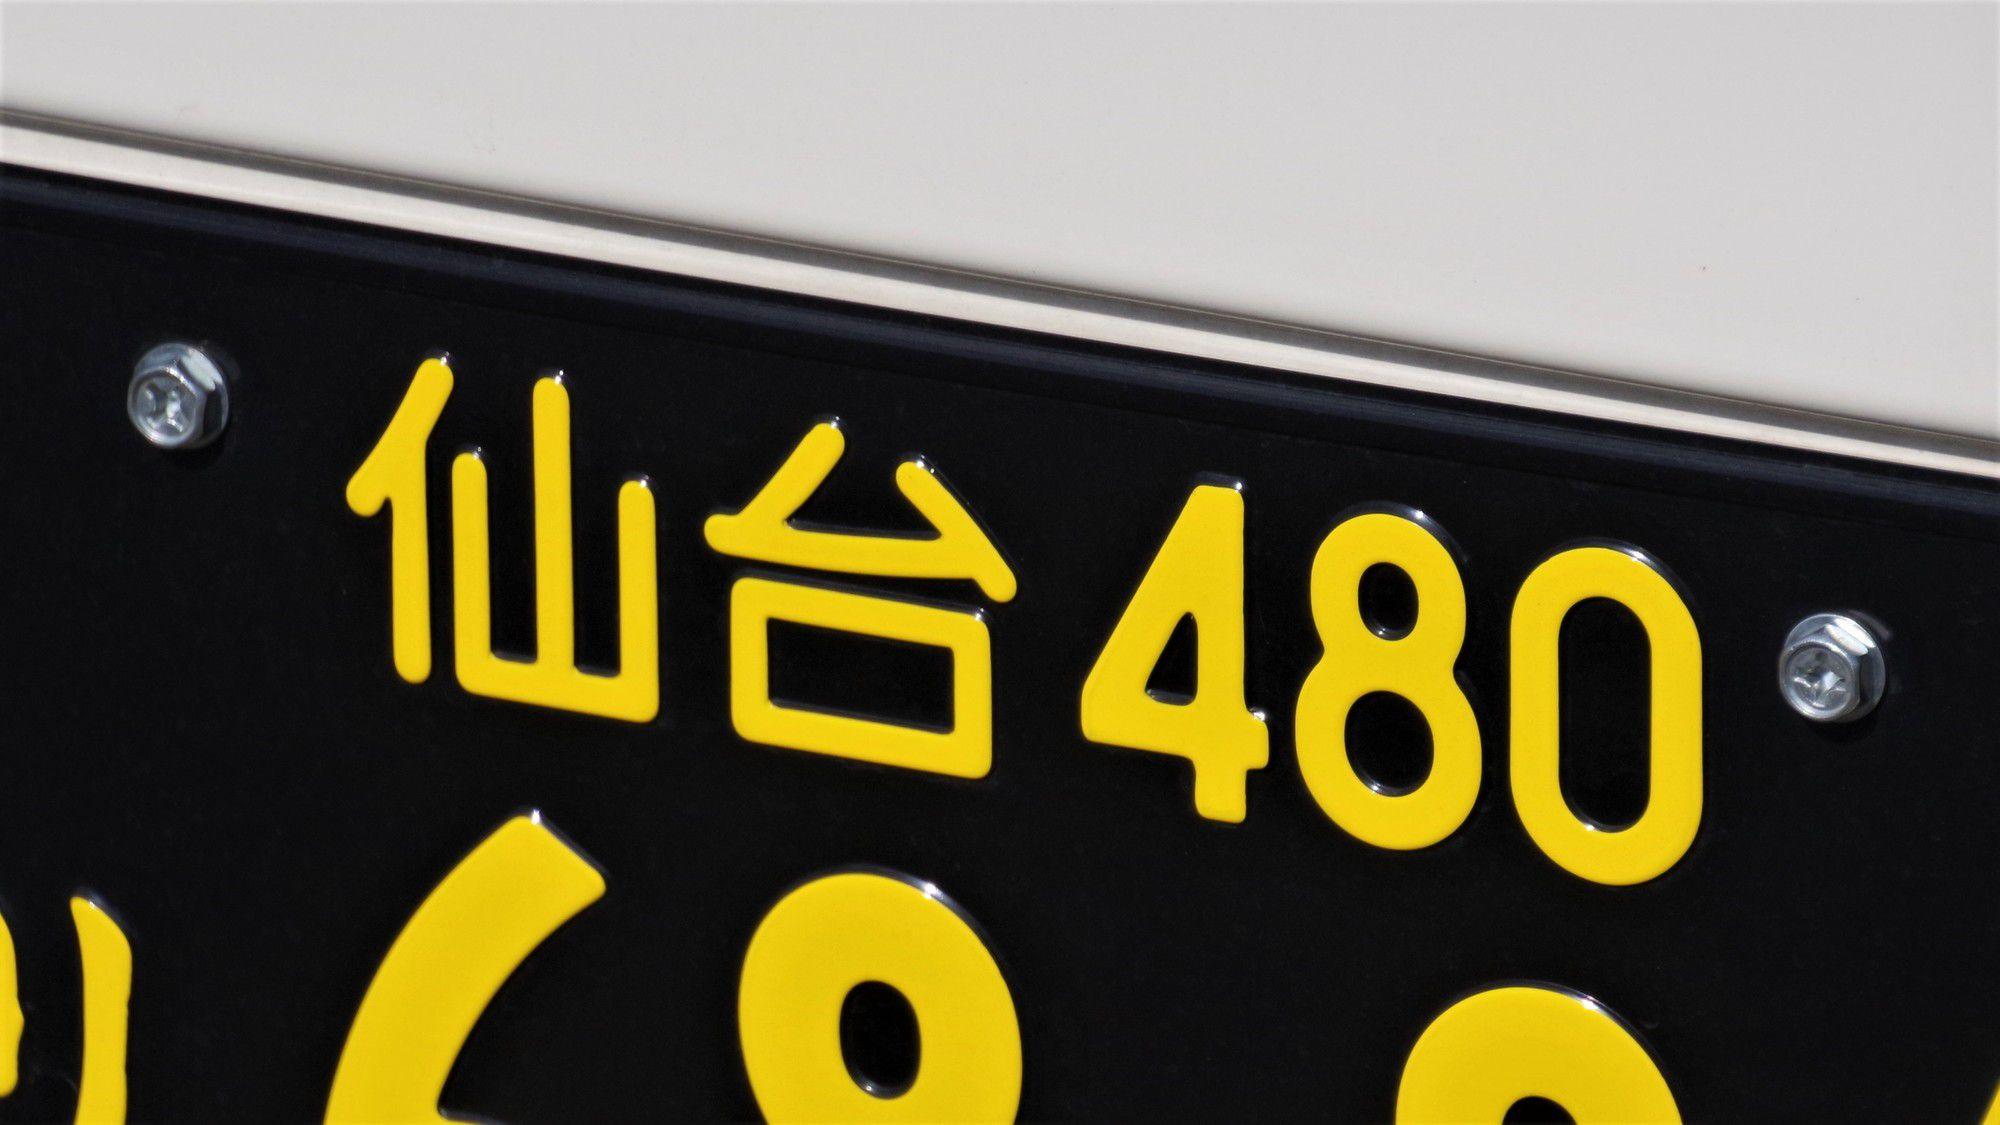 "<span class=""title"">軽貨物運送で必要な黒ナンバーはどうやって取得するの?</span>"